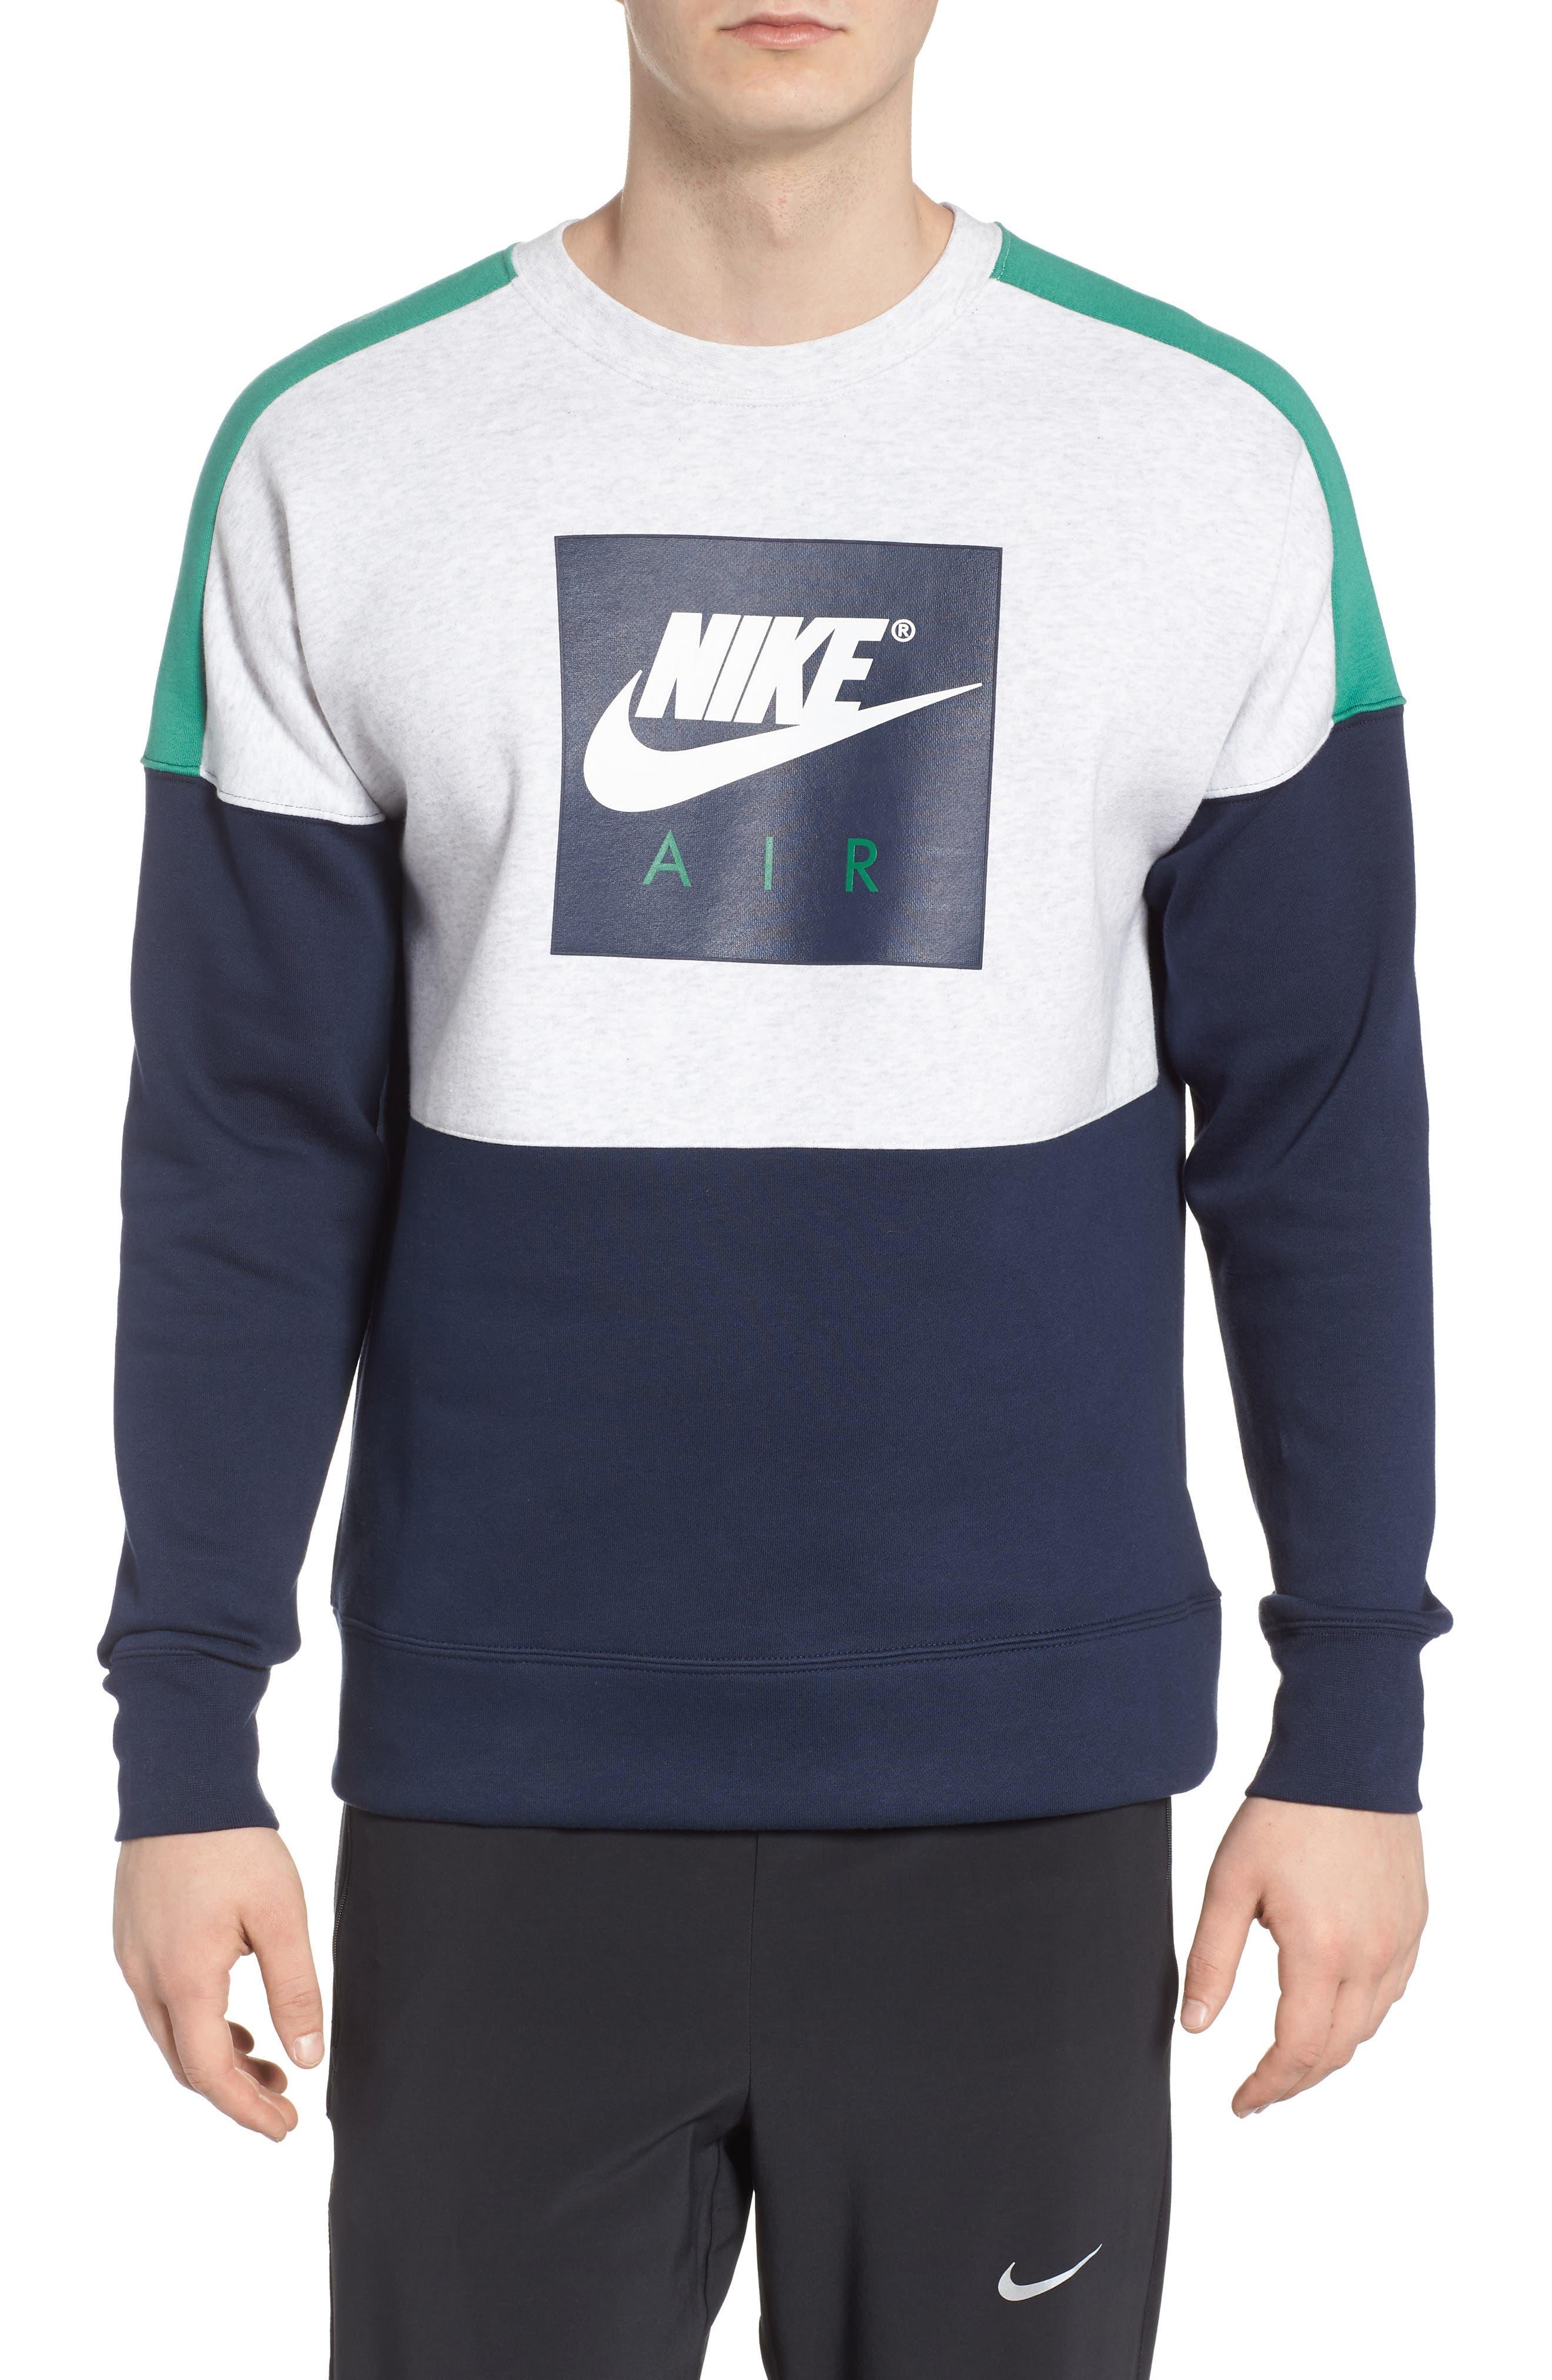 NSW Air Crewneck Sweatshirt,                         Main,                         color, Birch/ Green/ Obsidian/ White